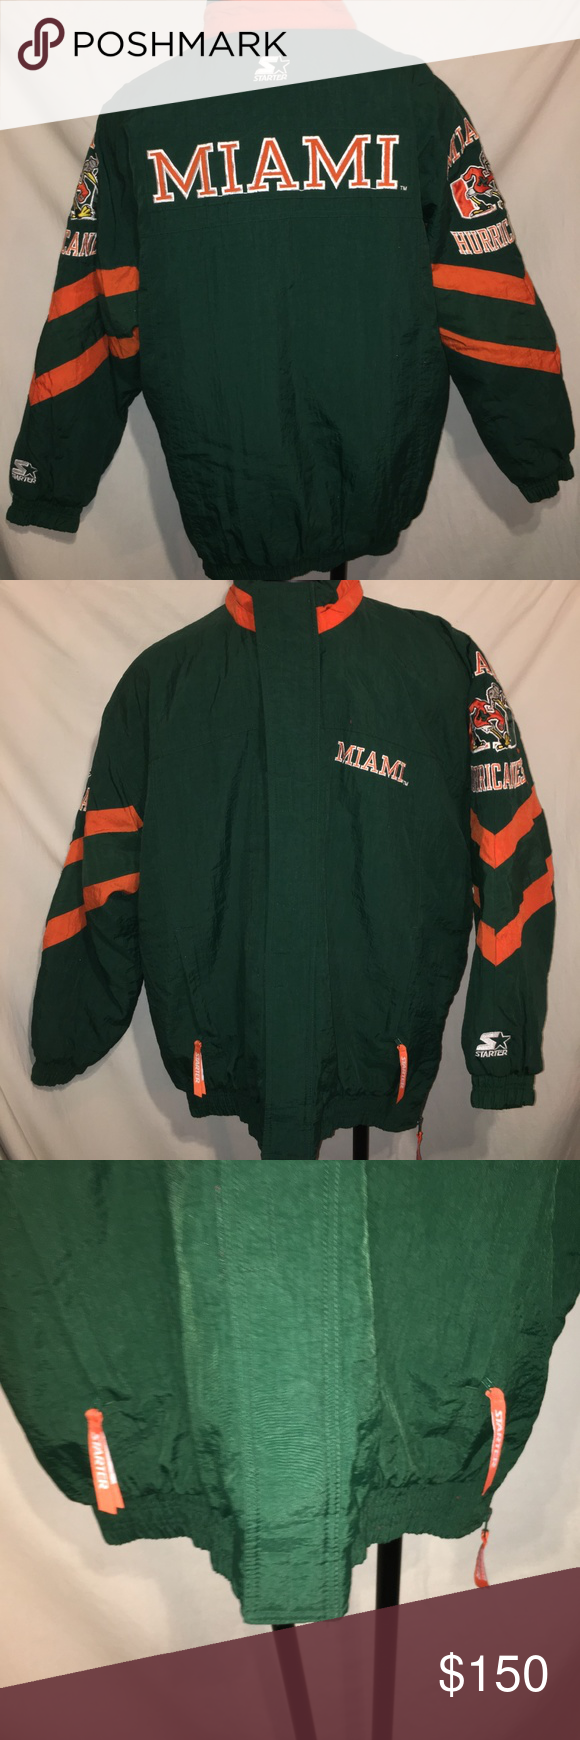 Vintage 90 S Miami Hurricanes Starter Jacket Xl Vintage 90 S Starter Jacket Miami Hurricanes Full Zip Heavy Jacket Size Xl Jackets Heavy Jacket Clothes Design